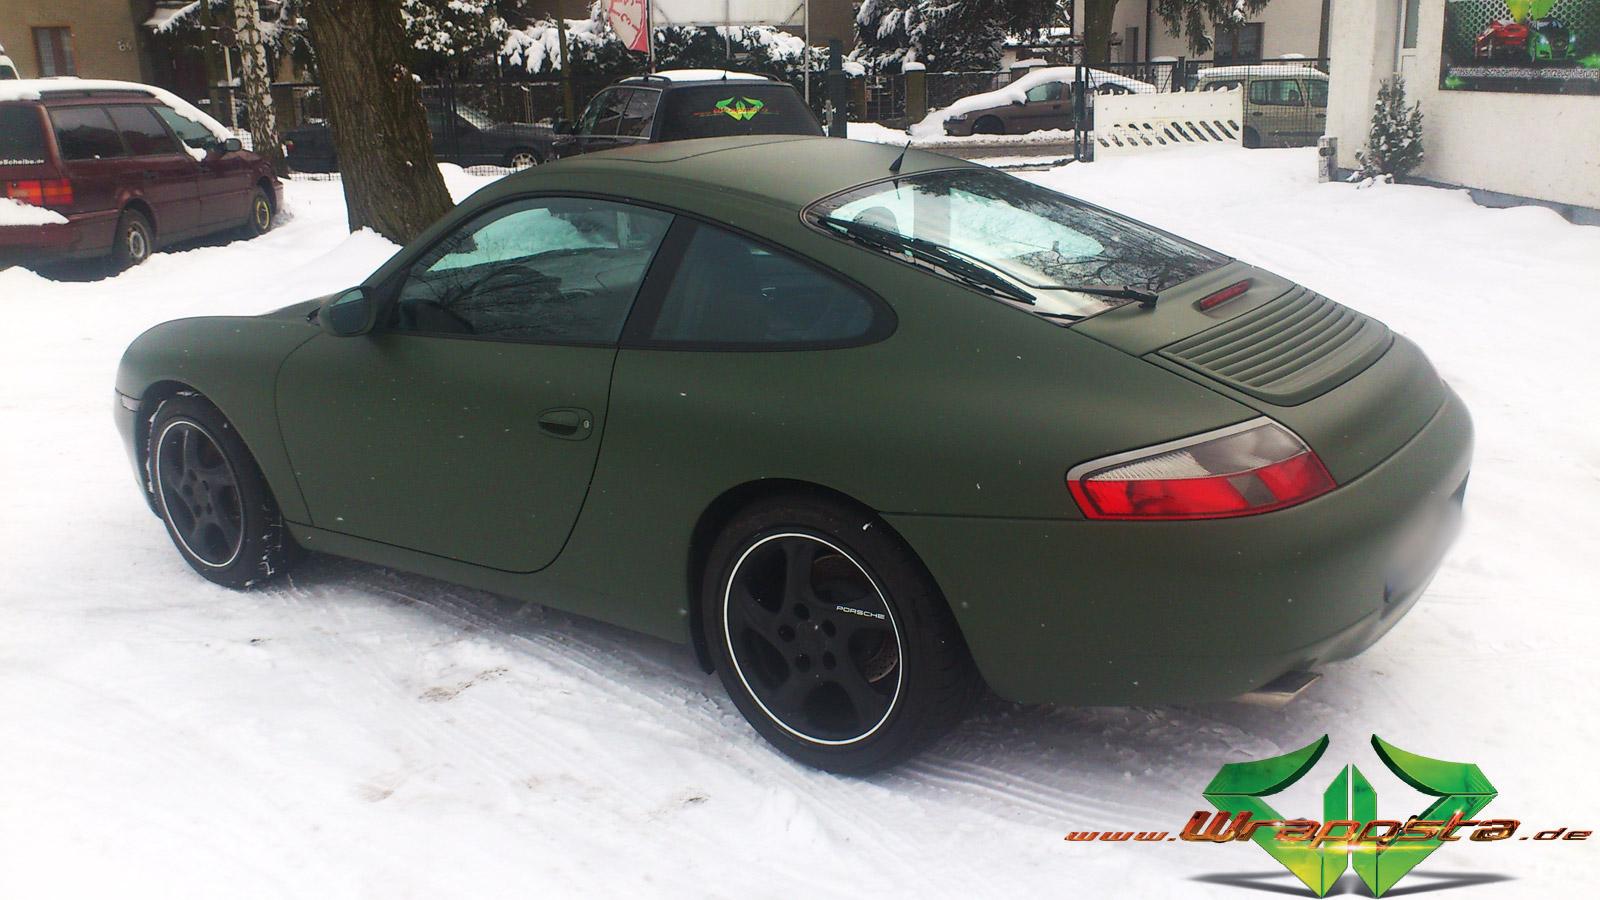 Porsche Carrera - Nato Matt Olive - Wrappsta Berlin